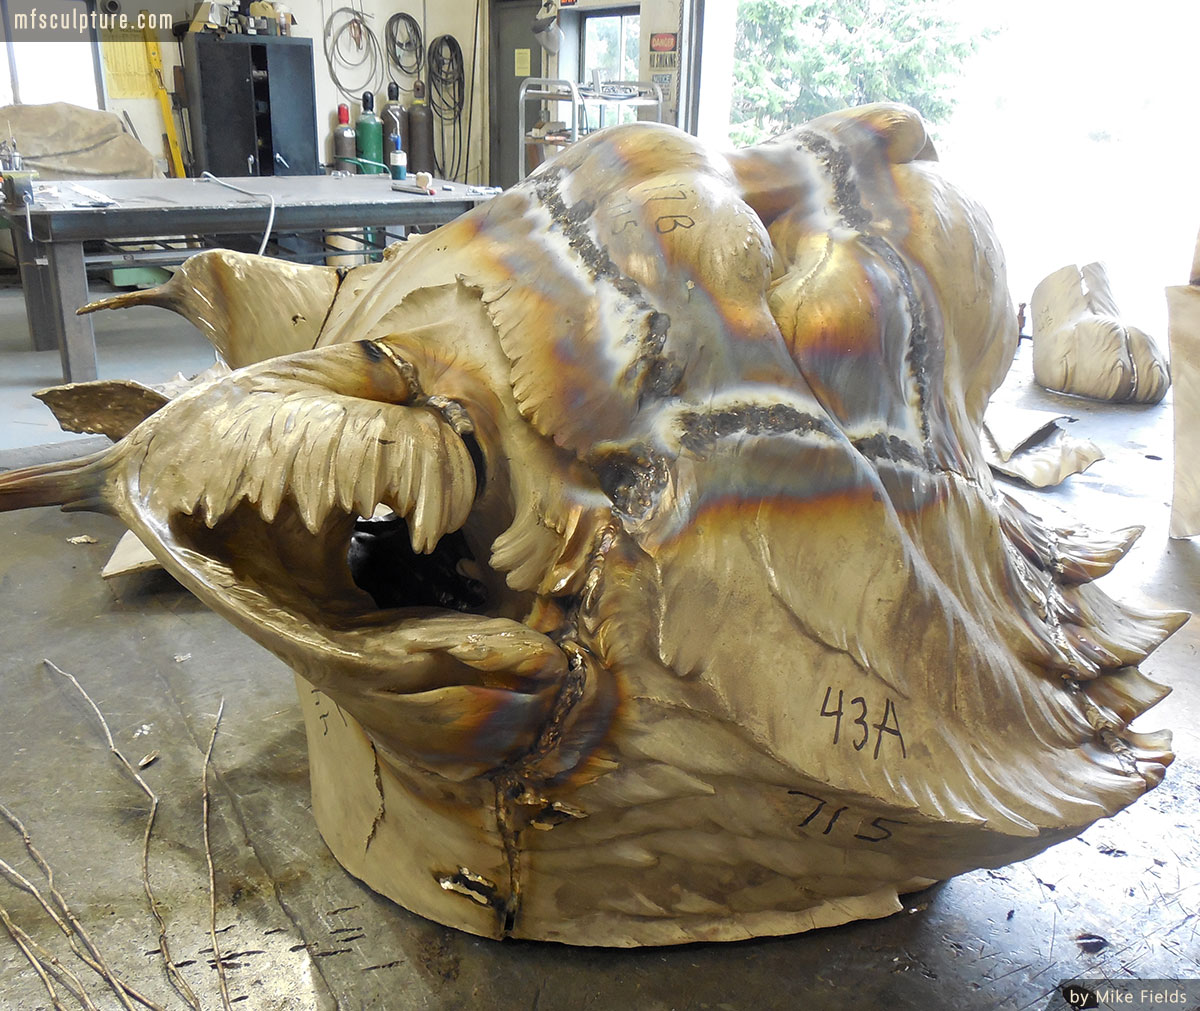 JWU University Wildcat Mascot Lost Wax Investment Casting Bobcat Monument 8